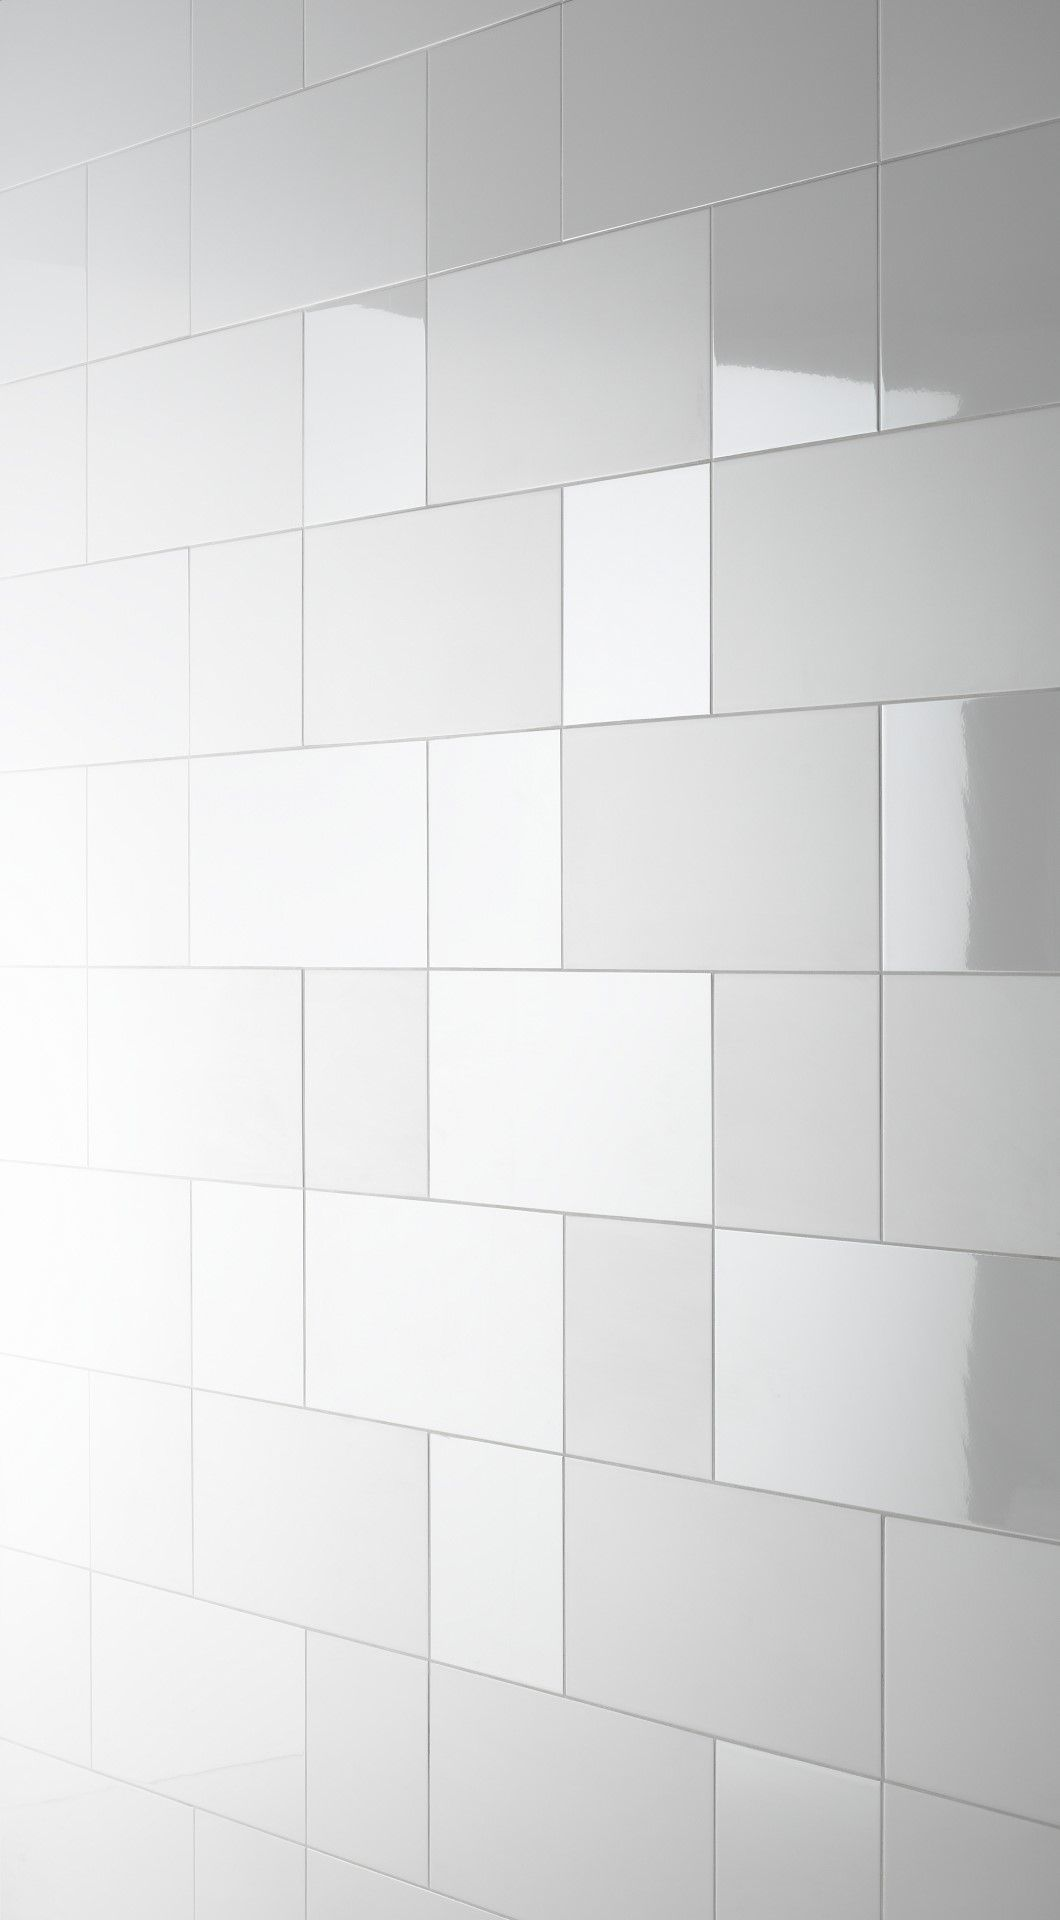 Murals, Mosa | Mosa.Tiles. | Pinterest | Bathroom laundry, Wall ...